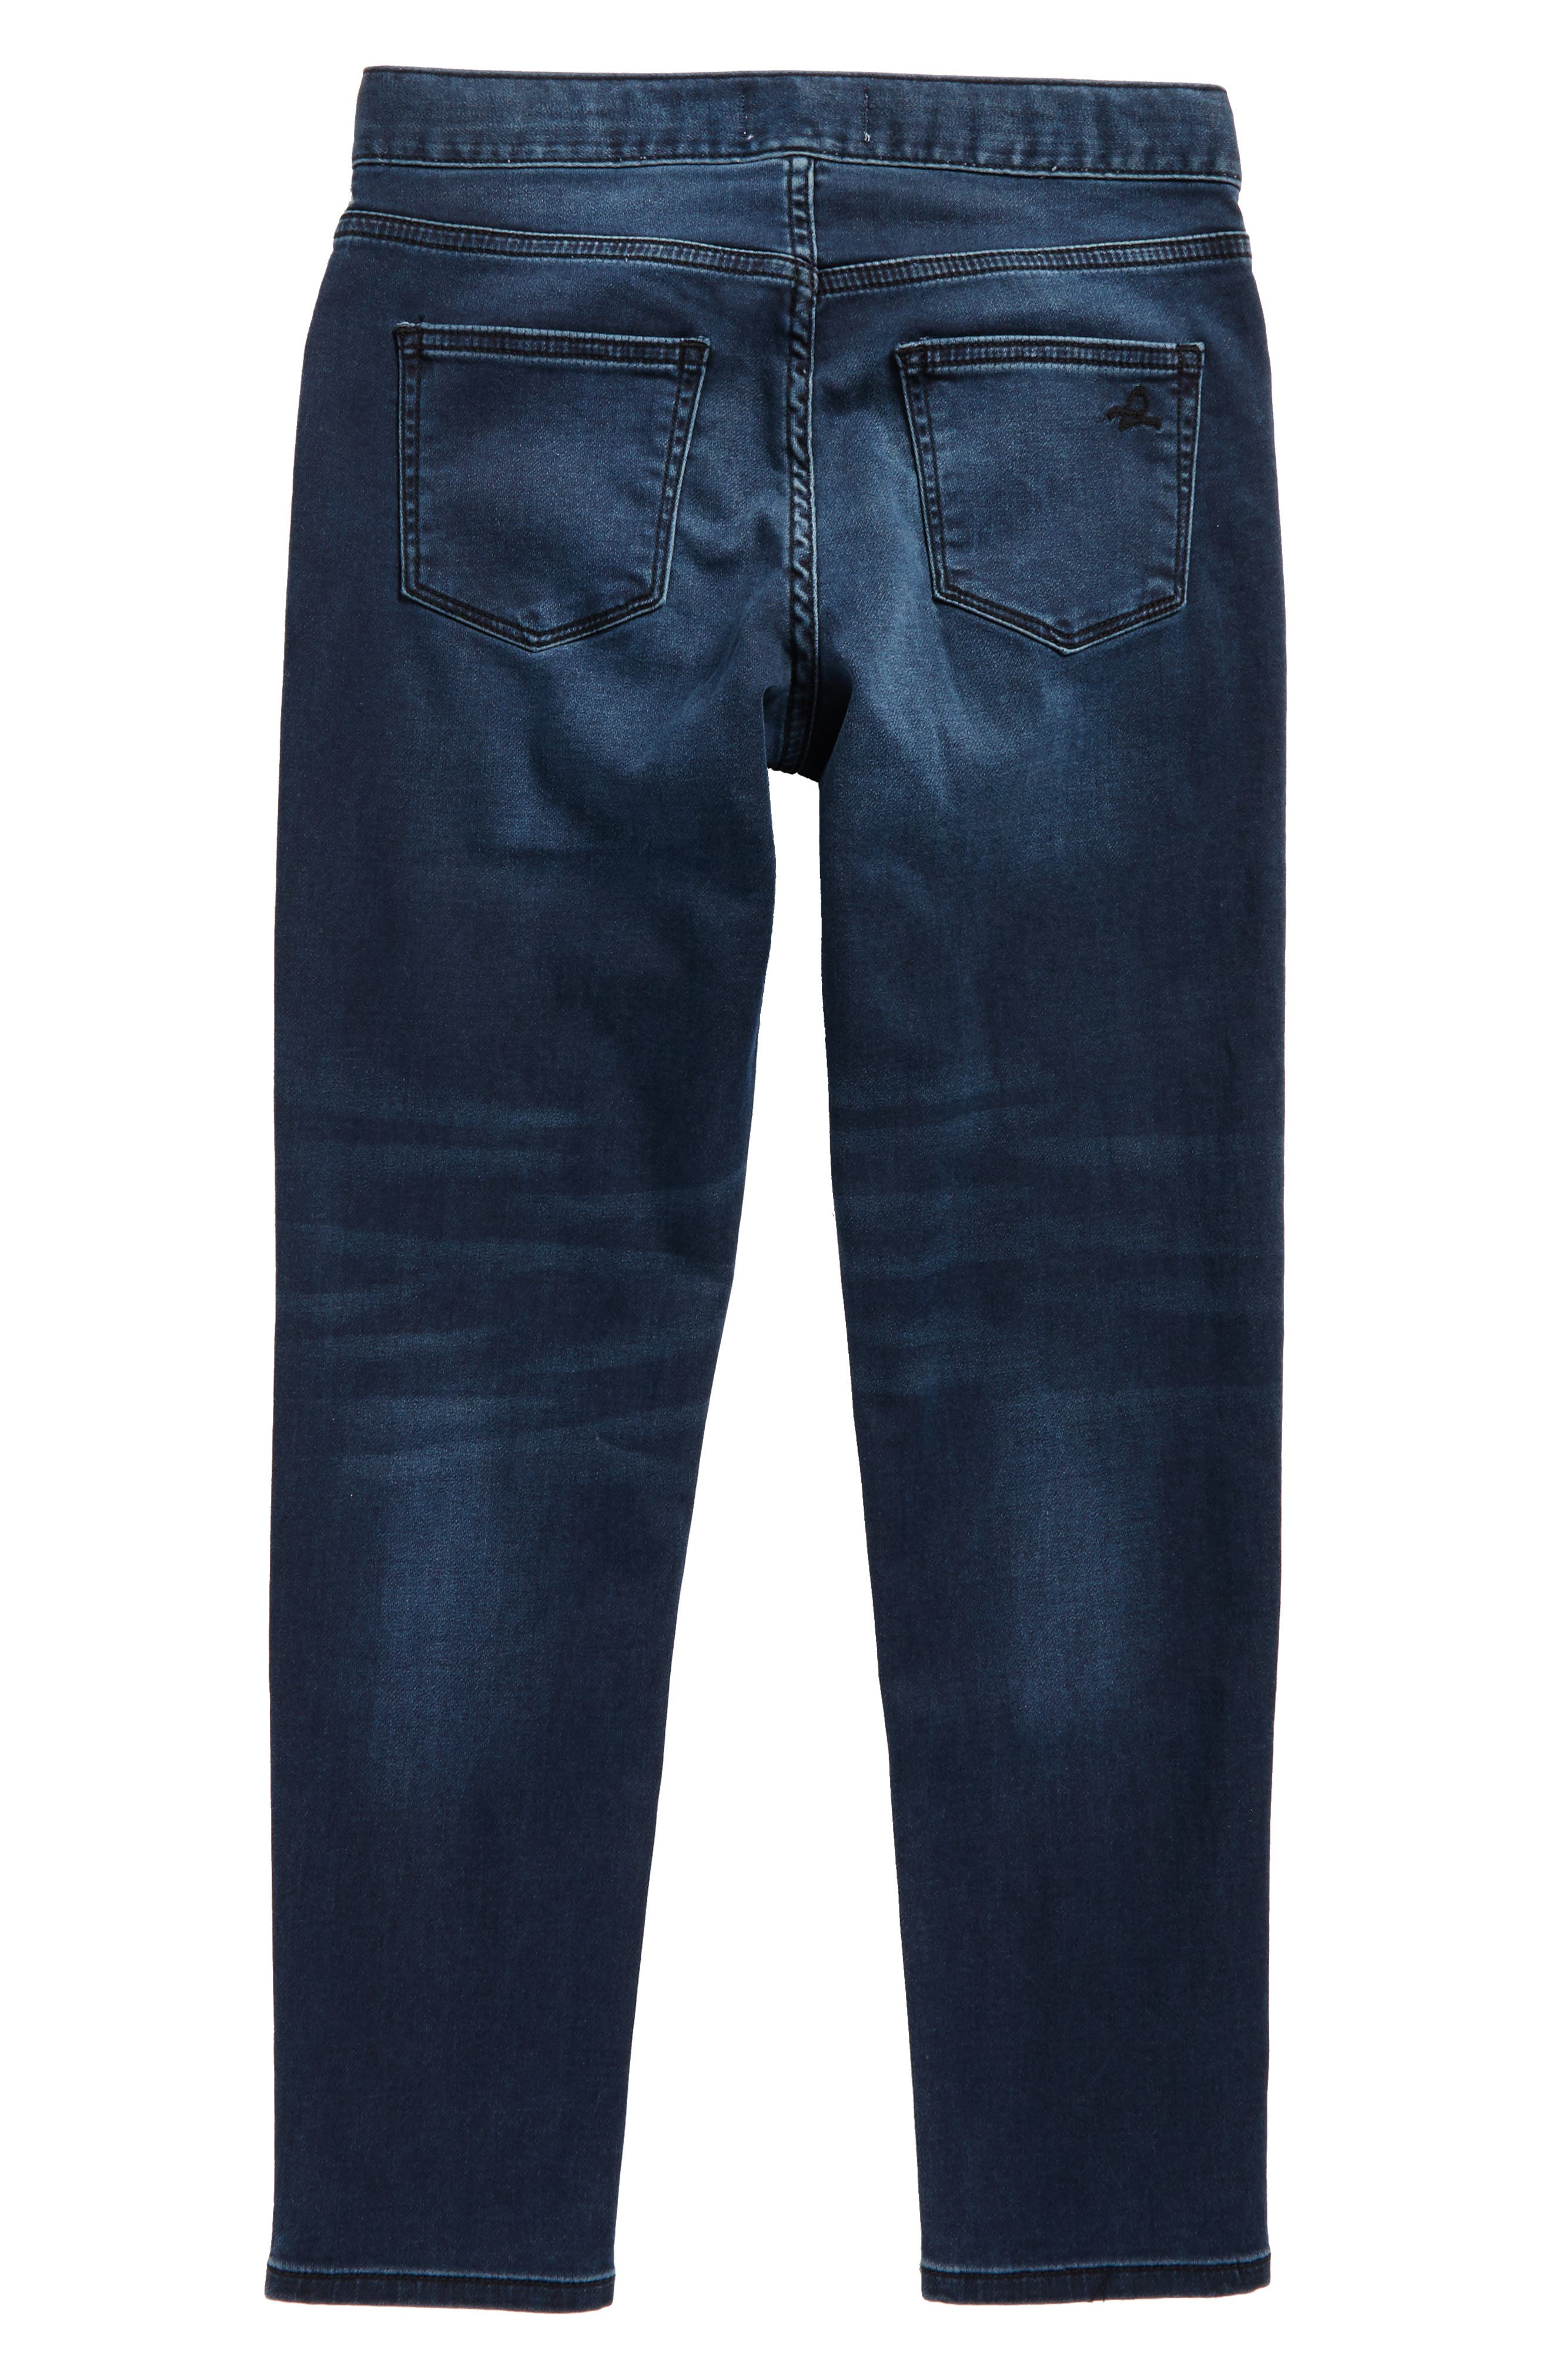 William Drawstring Jeans,                             Alternate thumbnail 2, color,                             RESERVE